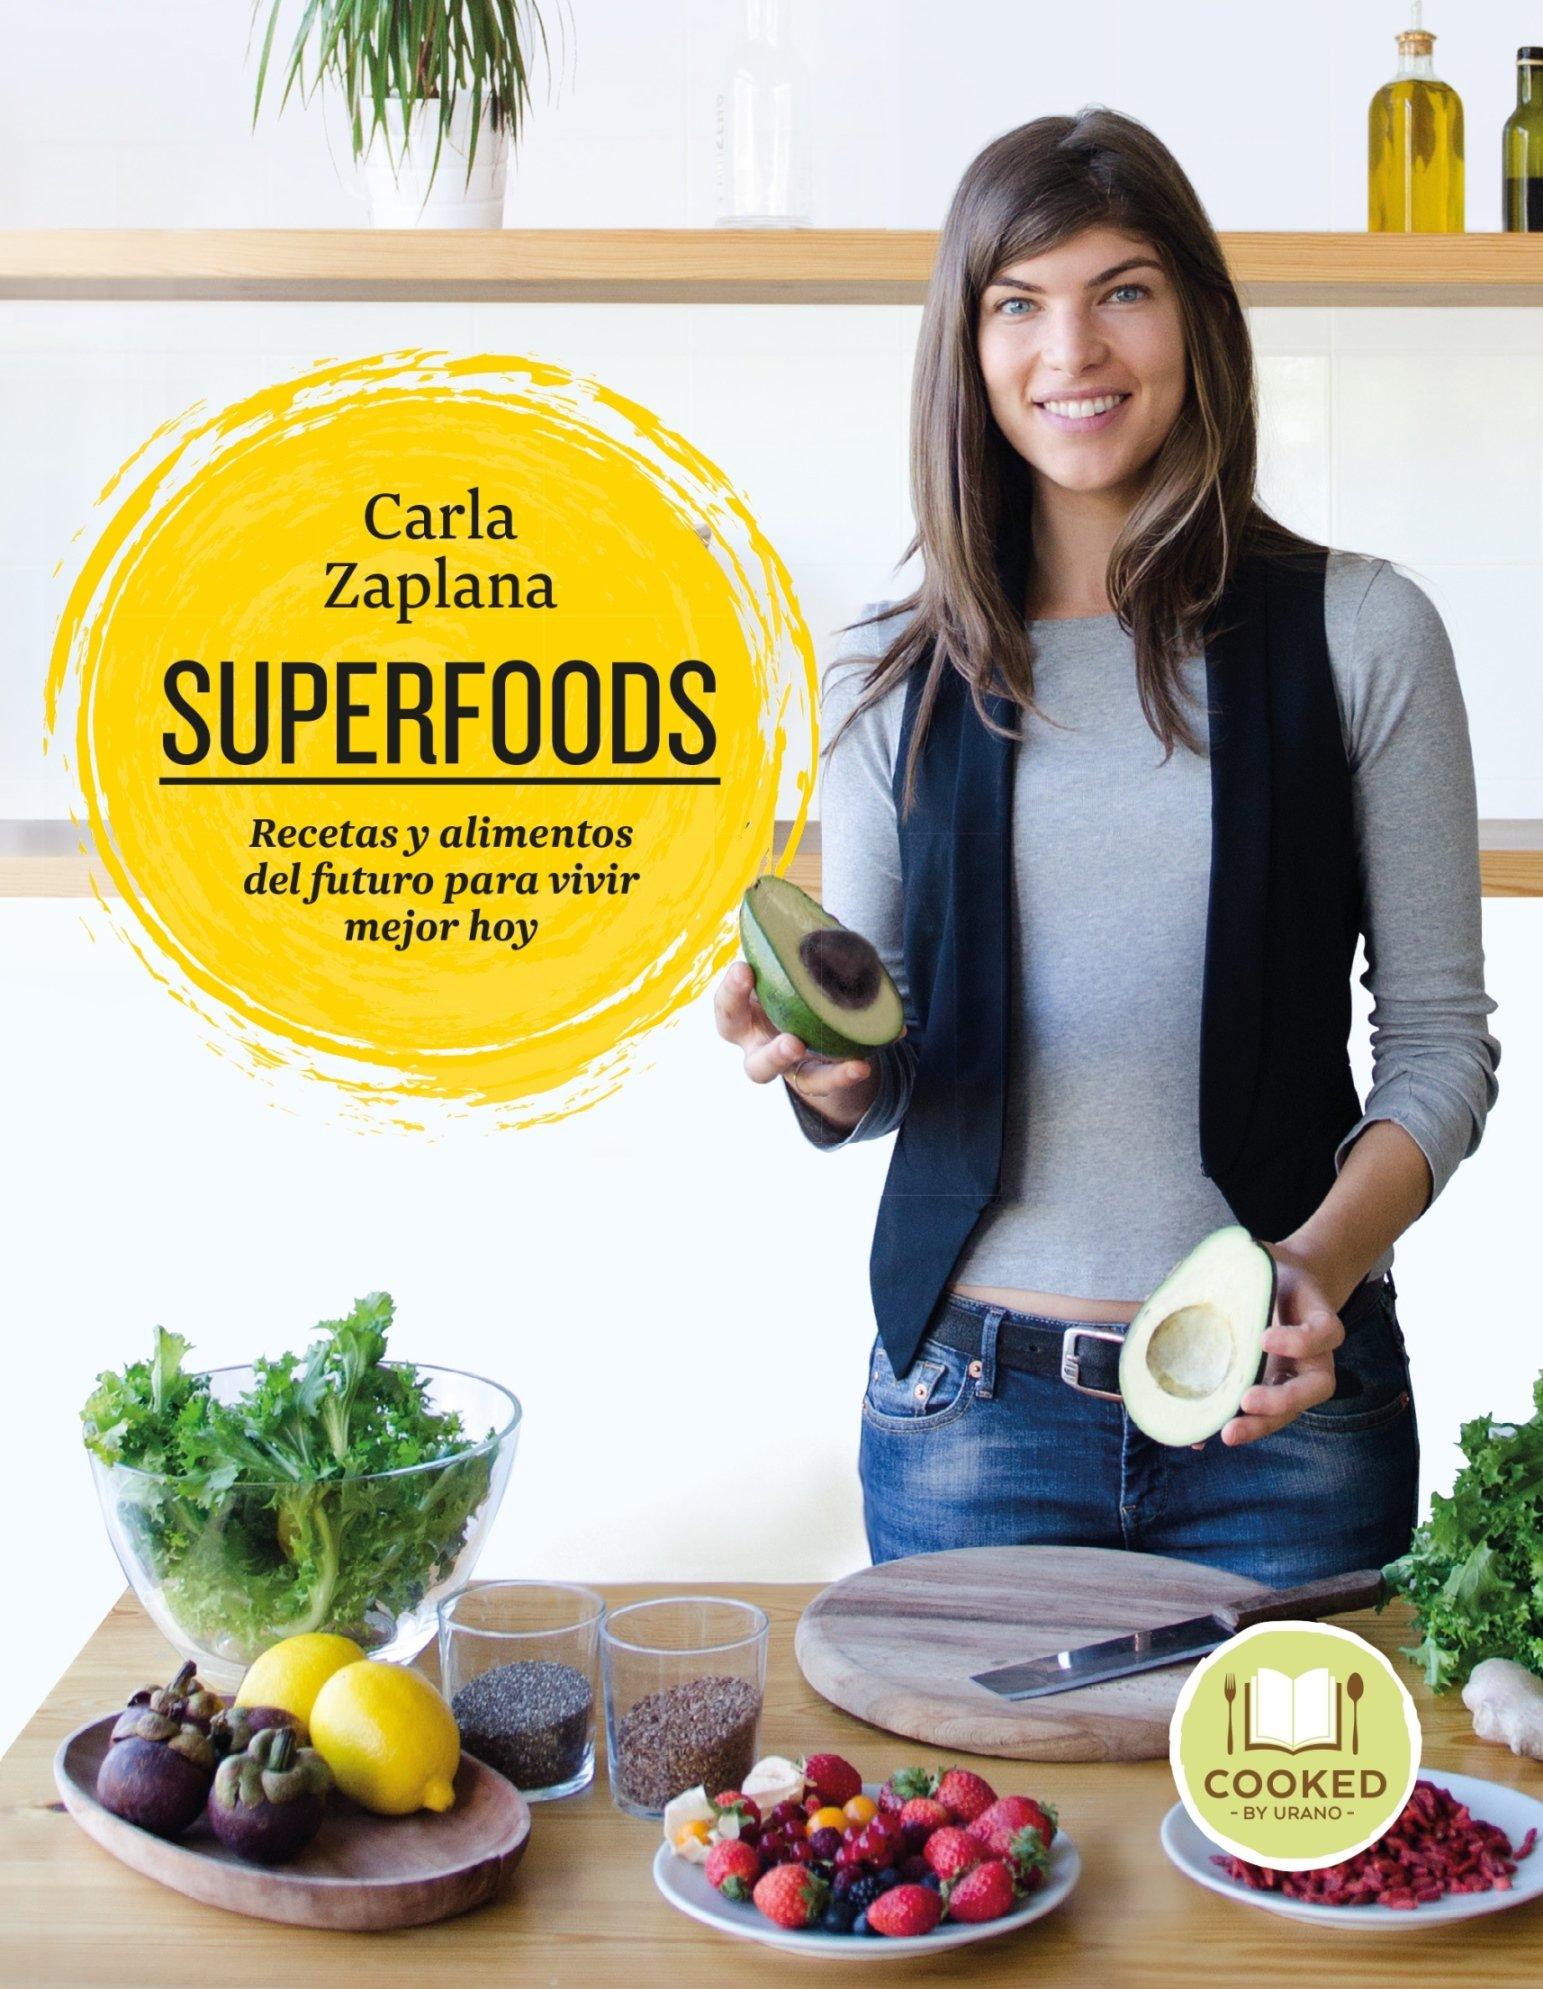 Superfoods (Spanish Edition): Carla Zaplana: 9788416720248: Amazon.com: Books